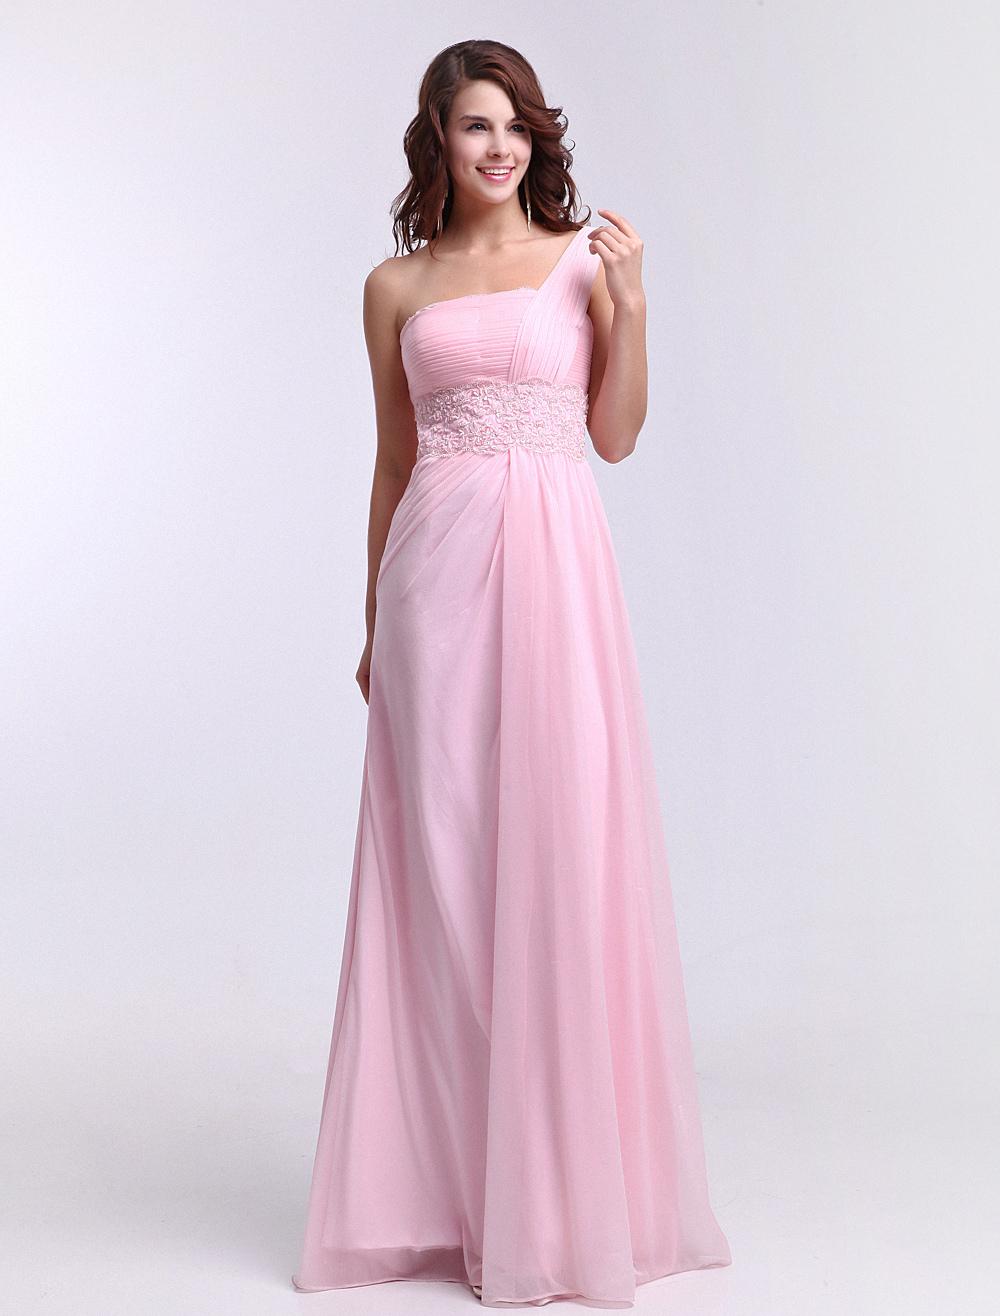 One-Shoulder Ruched Shot-silk Pink Elegant Bridesmaid Dress Milanoo